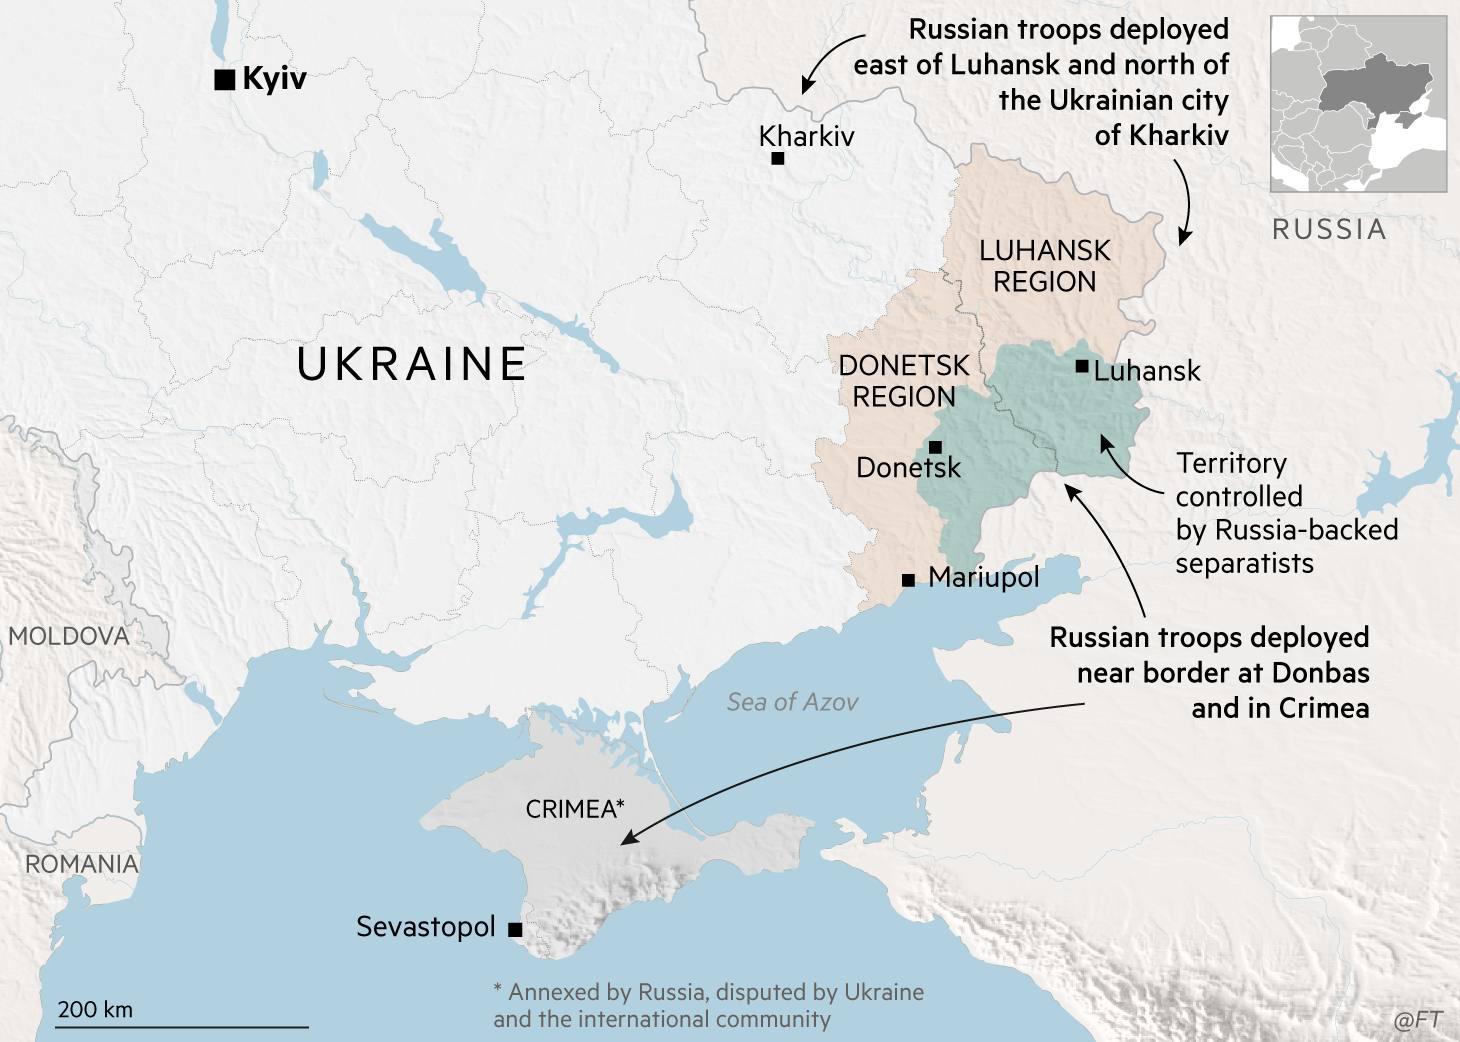 Ukraine map showing Russian troops forces near the Ukrainian border